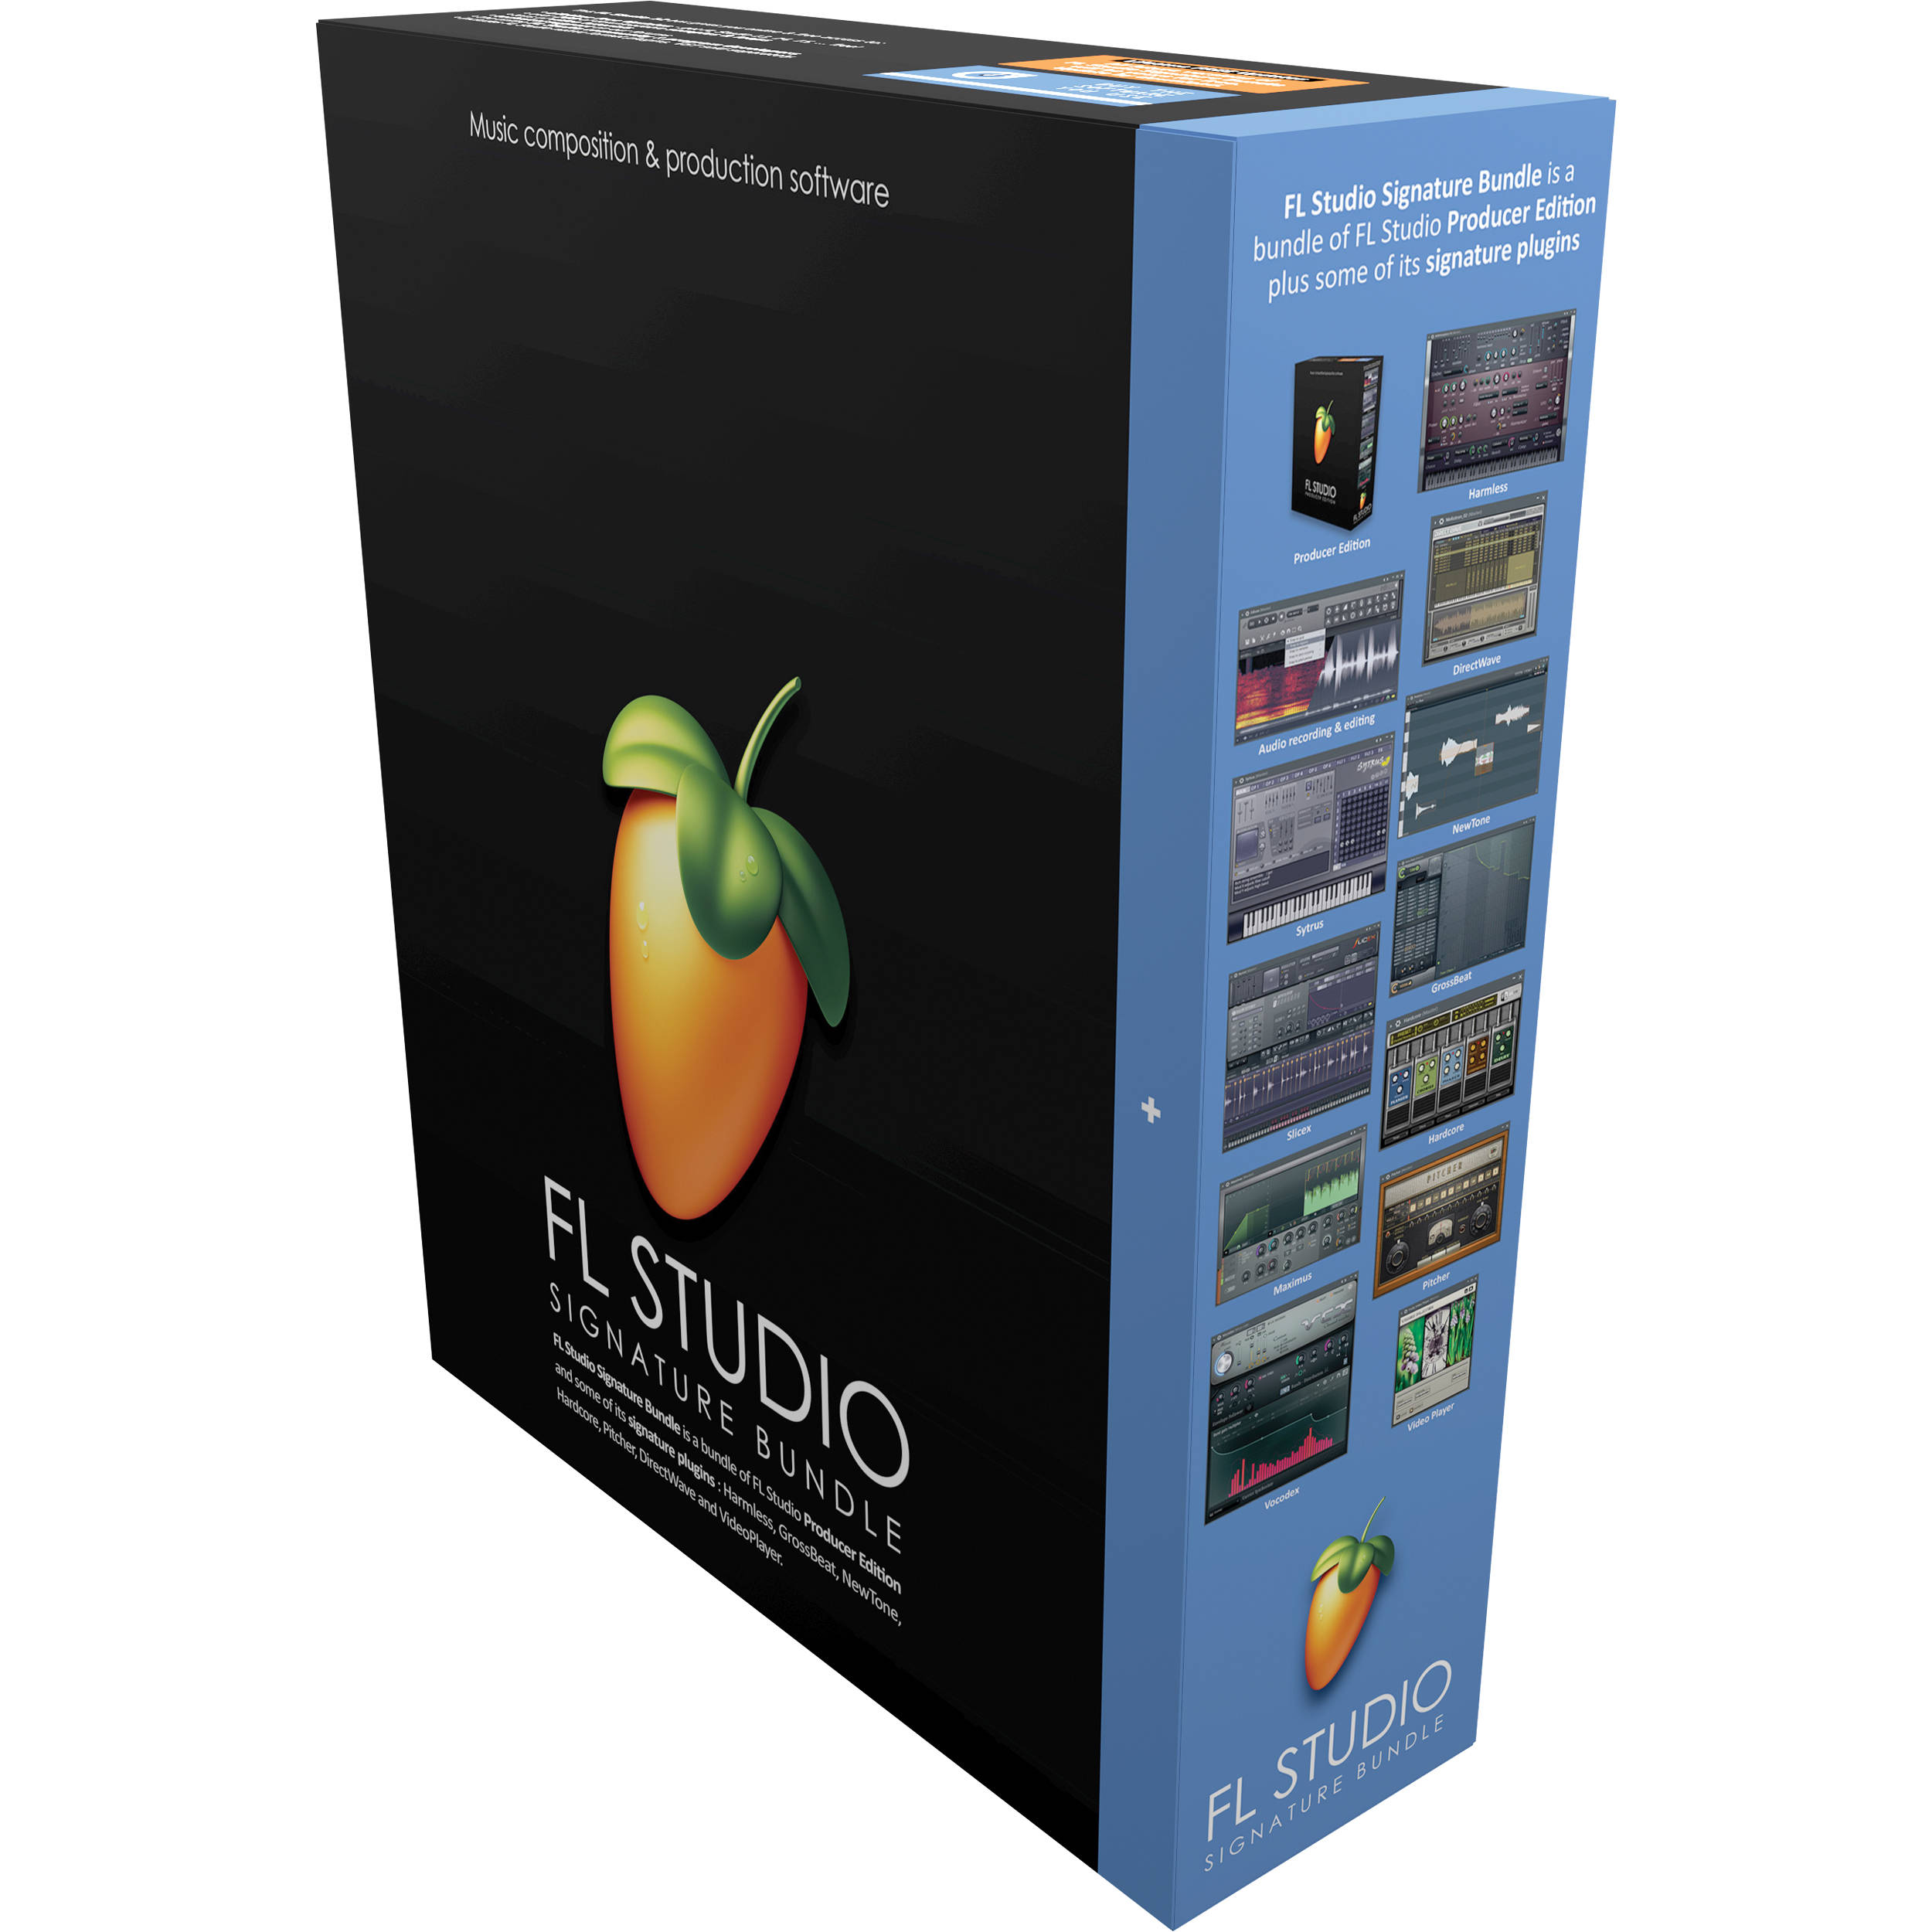 fl studio 12 beta mac download